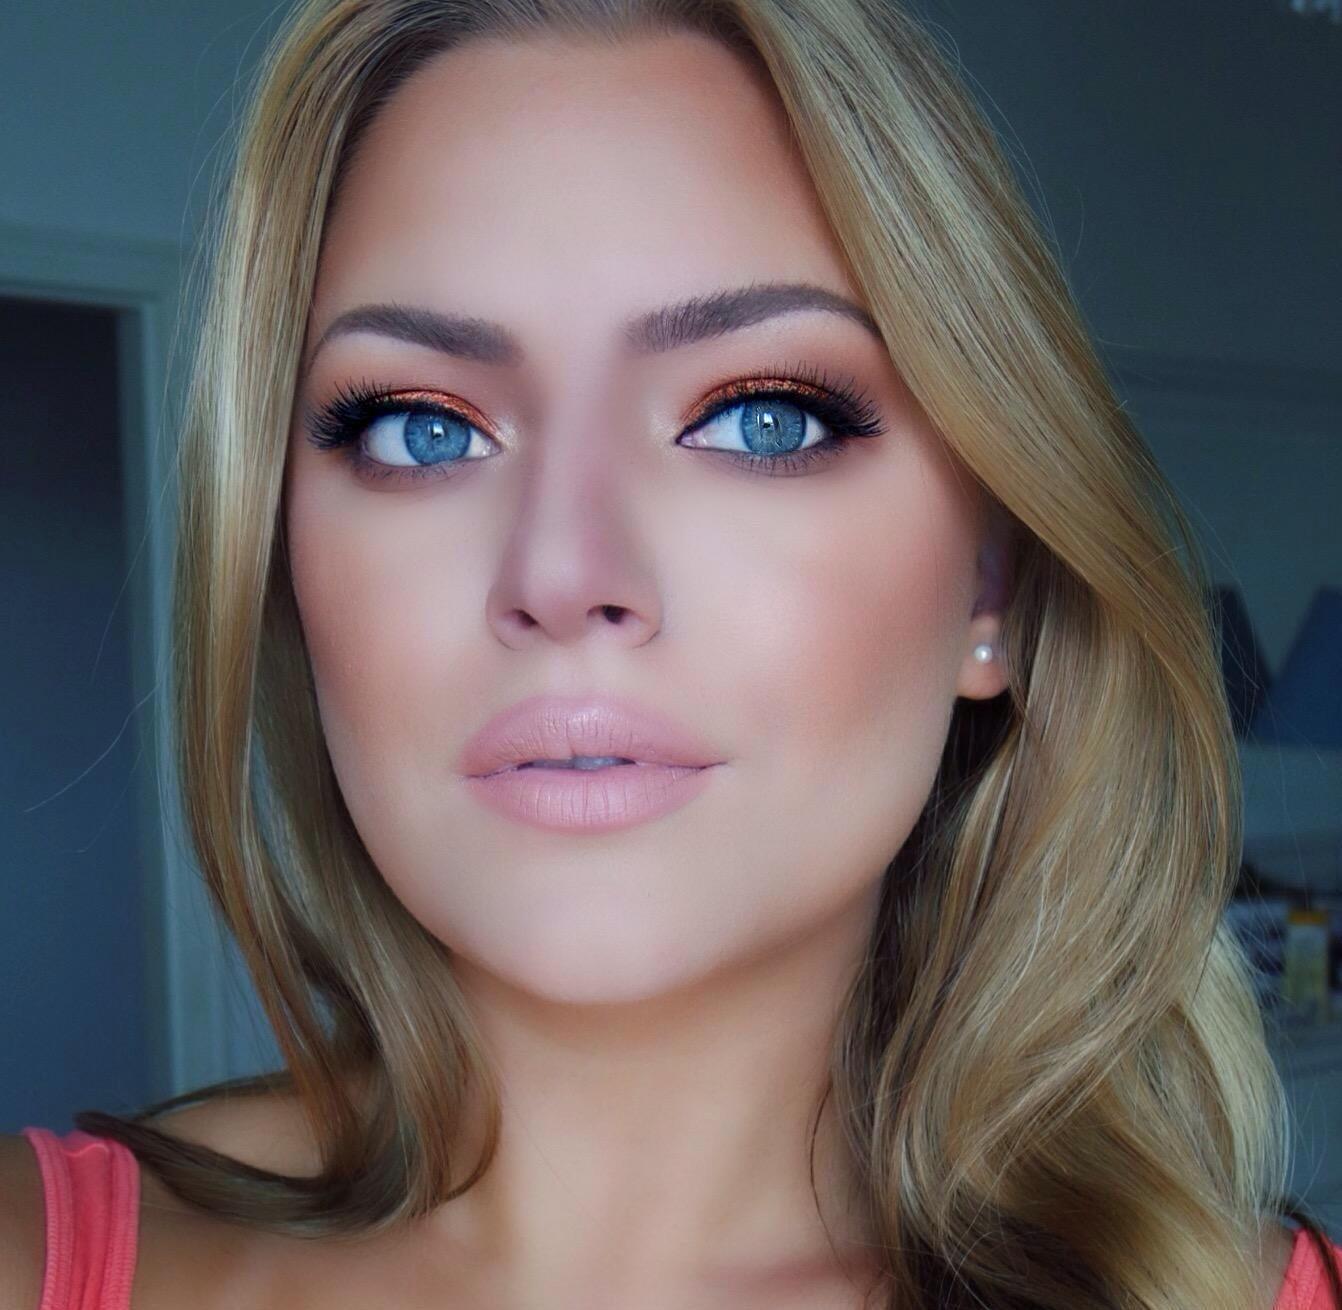 Makeup by Myrna - Beau...